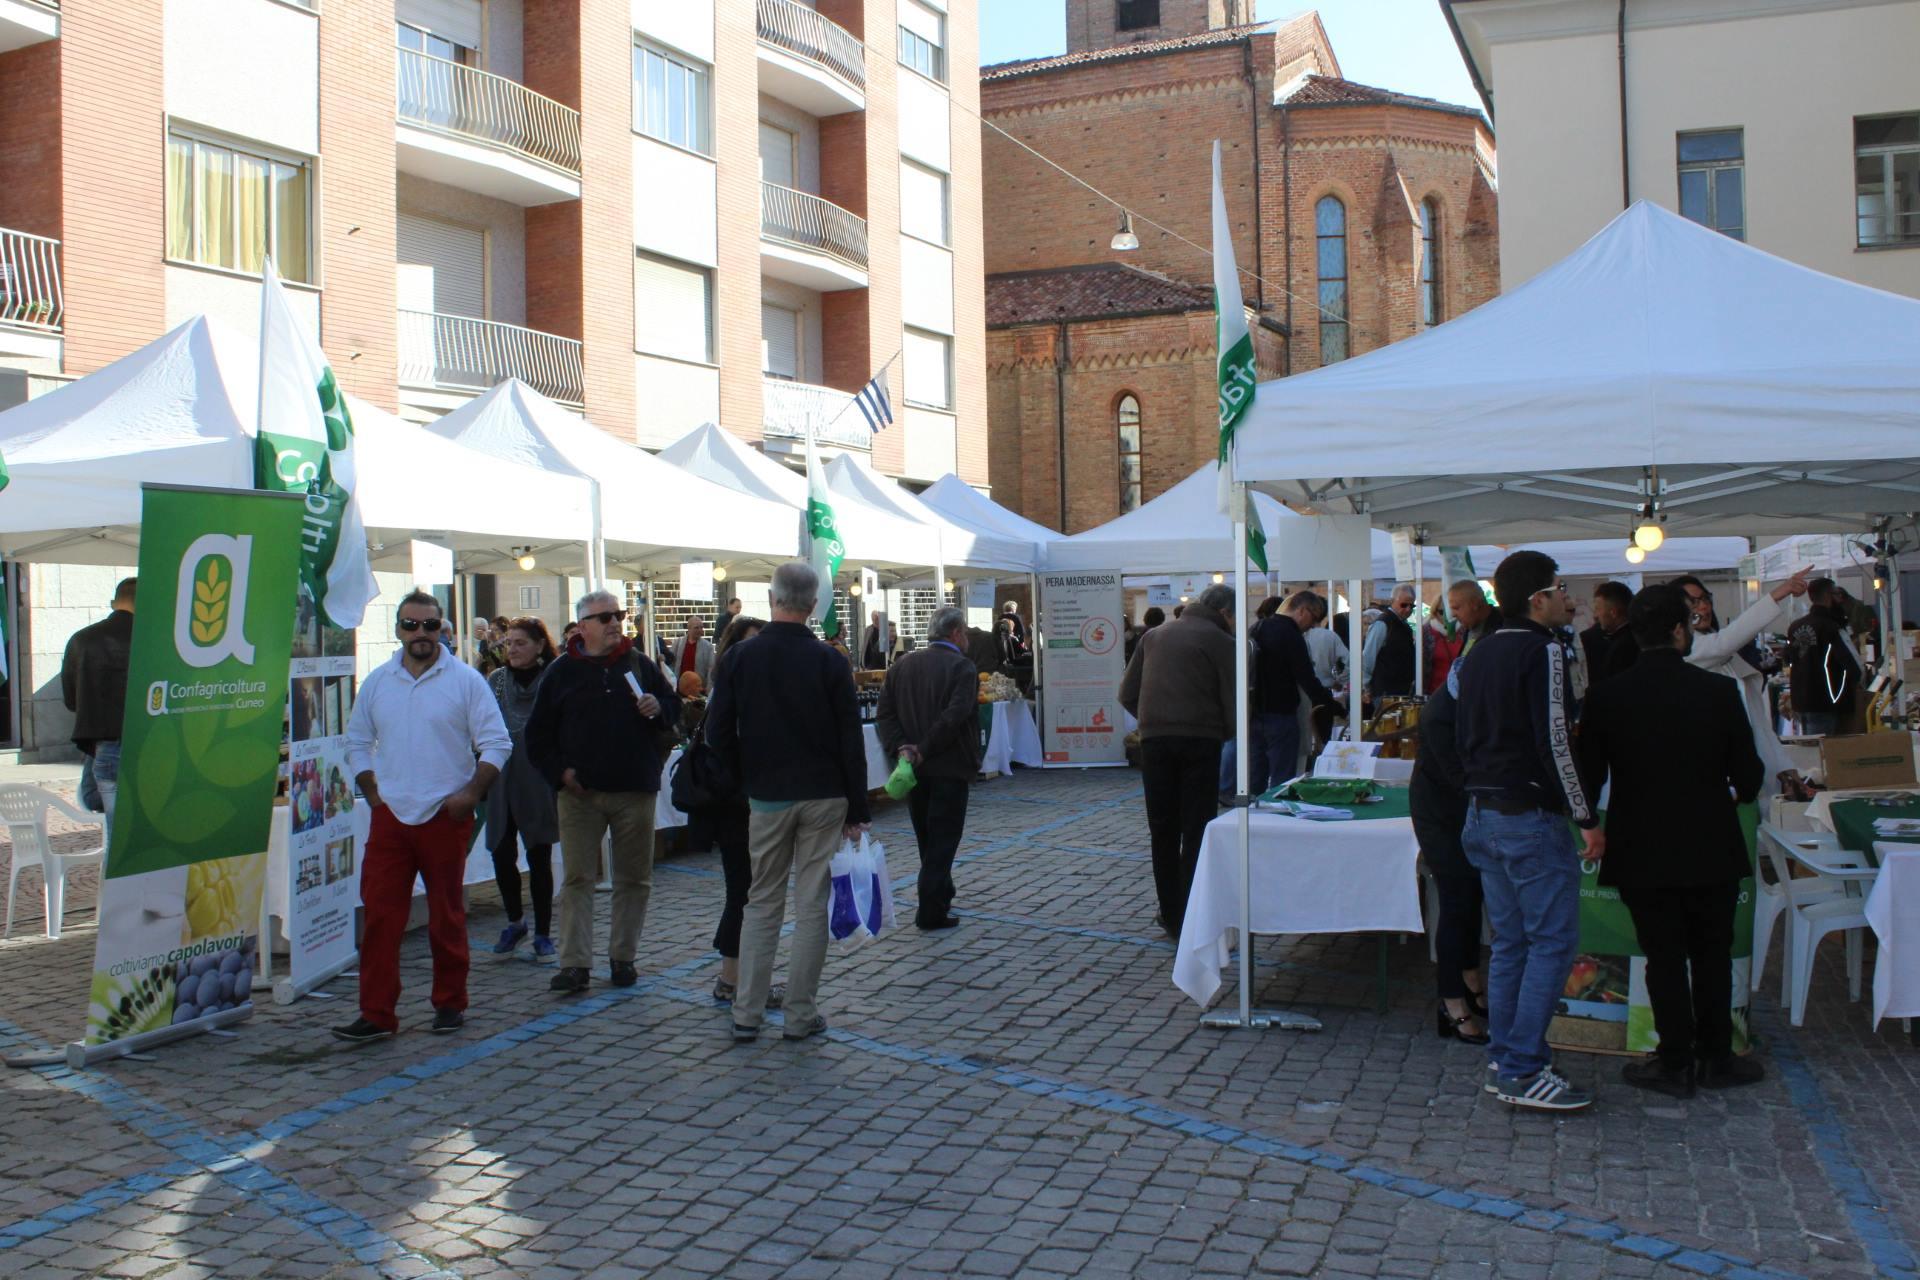 La Mostra Mercato di Confagricoltura ad Alba (ottobre 2017)